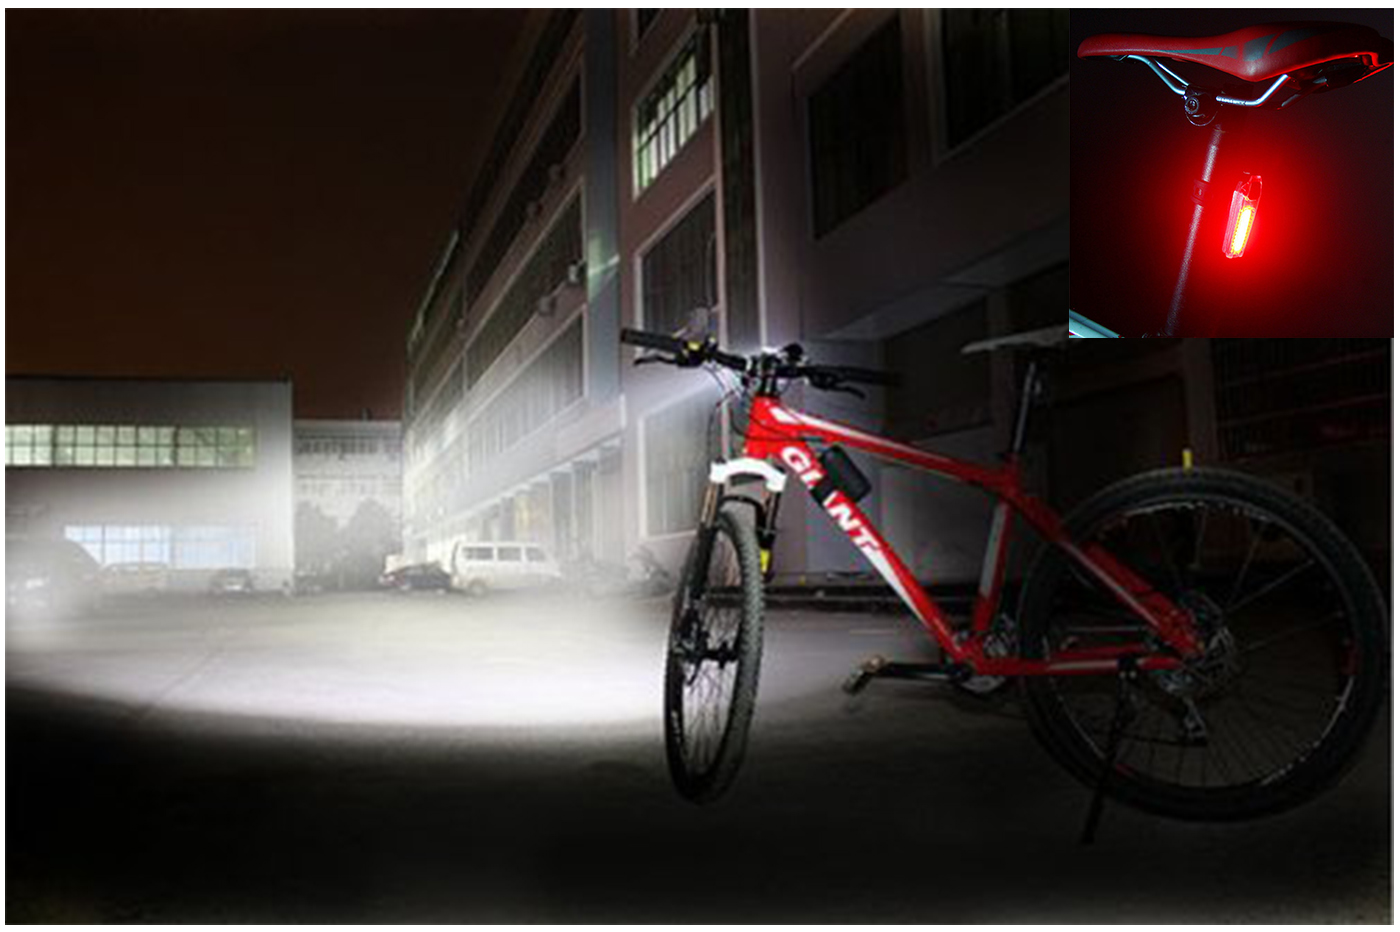 Bes 25340 bici beselettronica kit illuminazione bici faro led